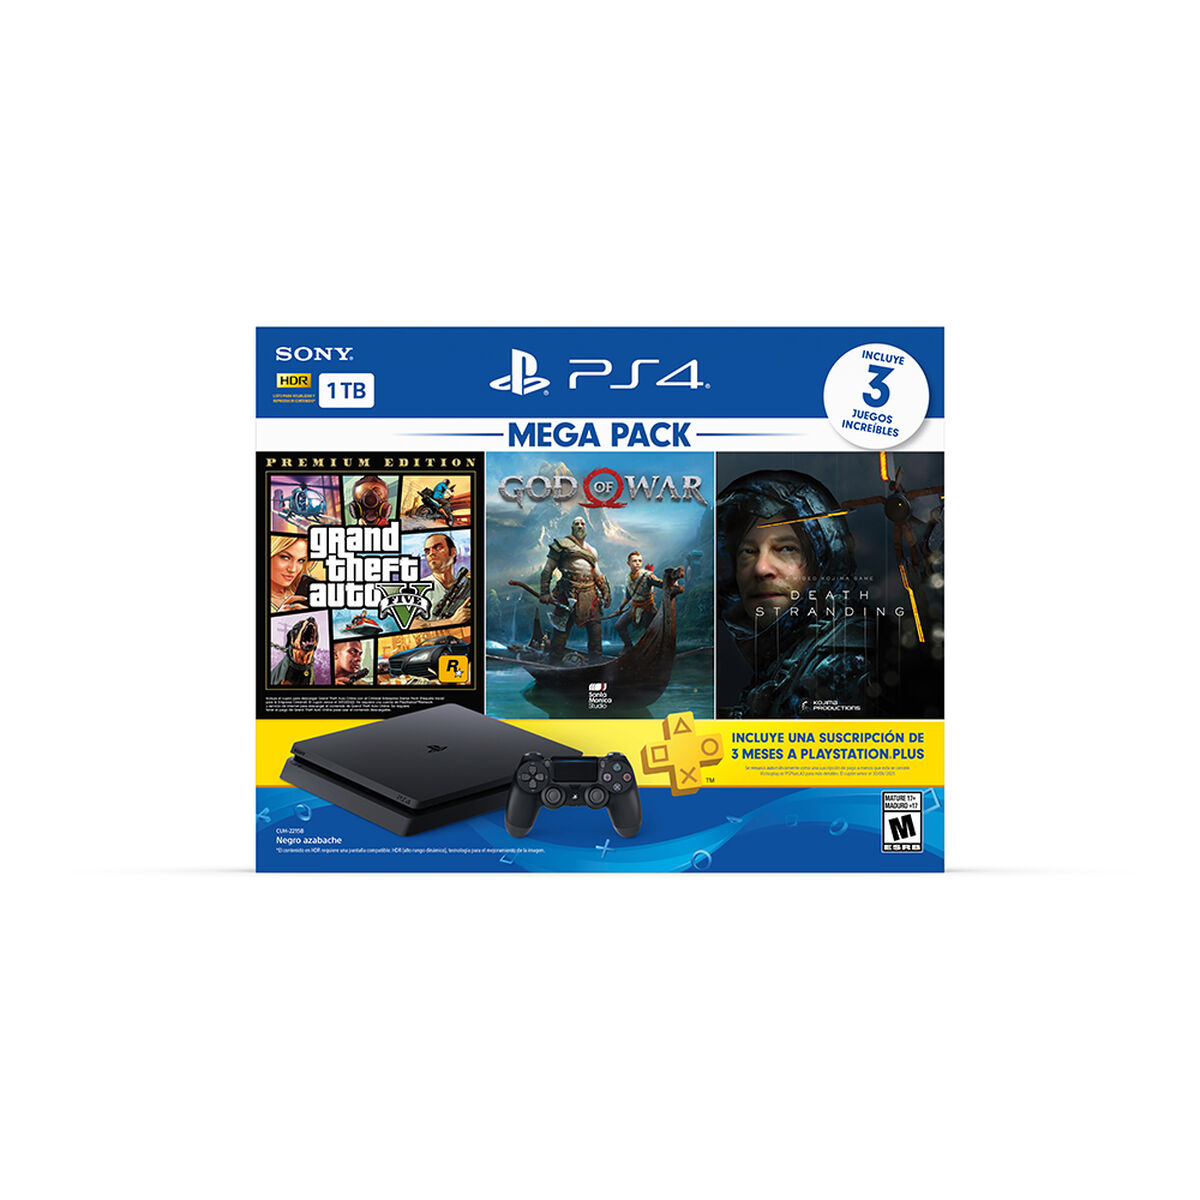 Bundle Megapack 13 Sony PS4 1TB + Control Dualshock + BD God of War + BD Death Stranding + BD Grand Theft Auto V Premium Edition